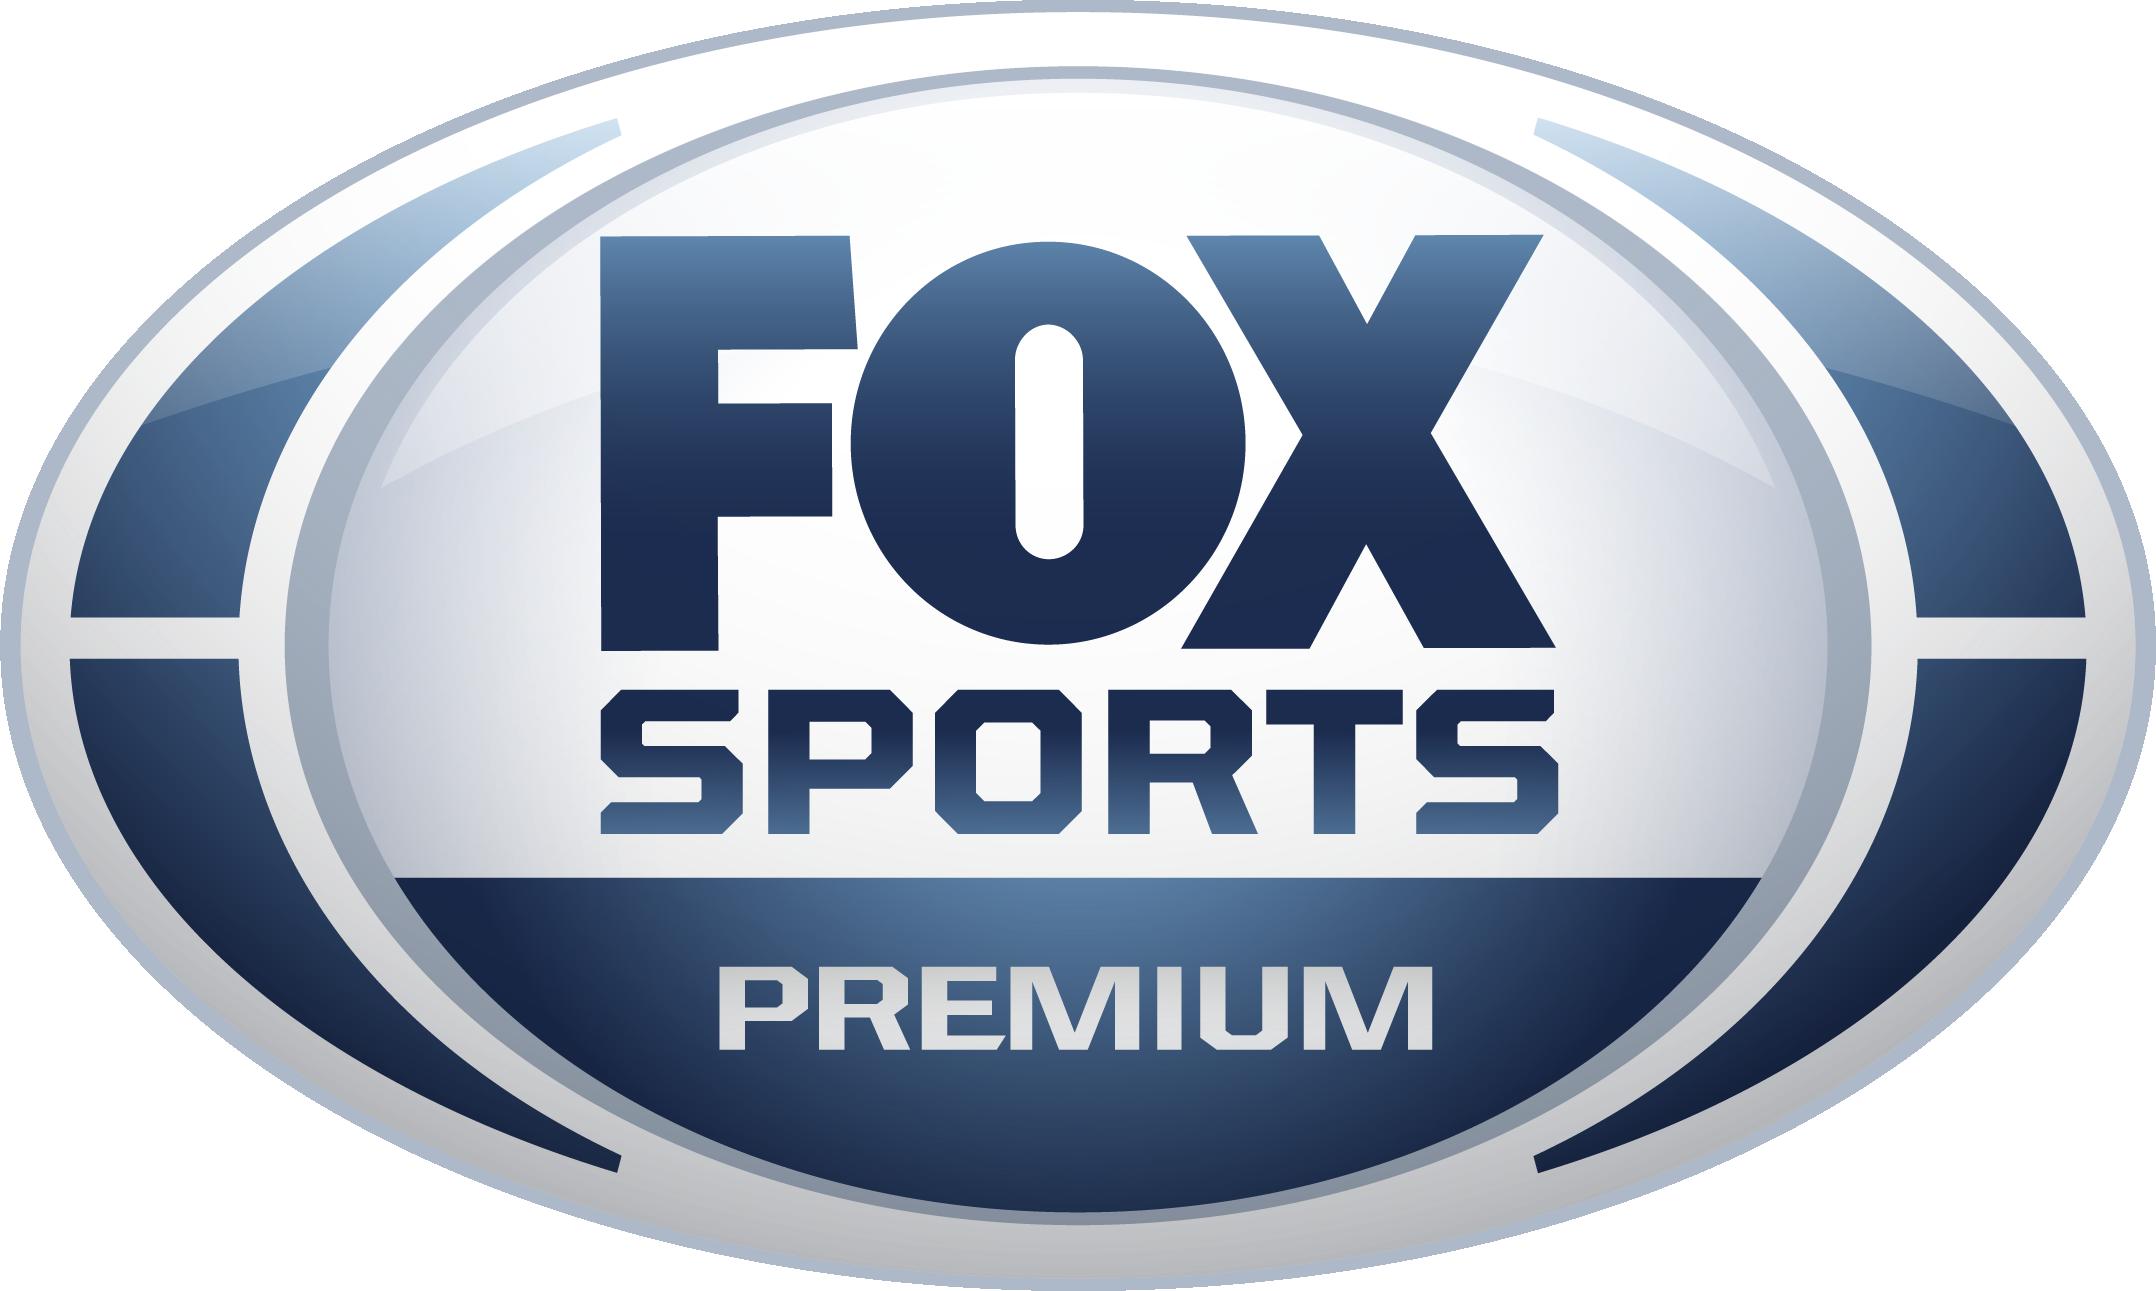 Archivo:Fox Sports Premium (Argentina) - 2018 logo.png - Wikipedia, la enciclopedia libre